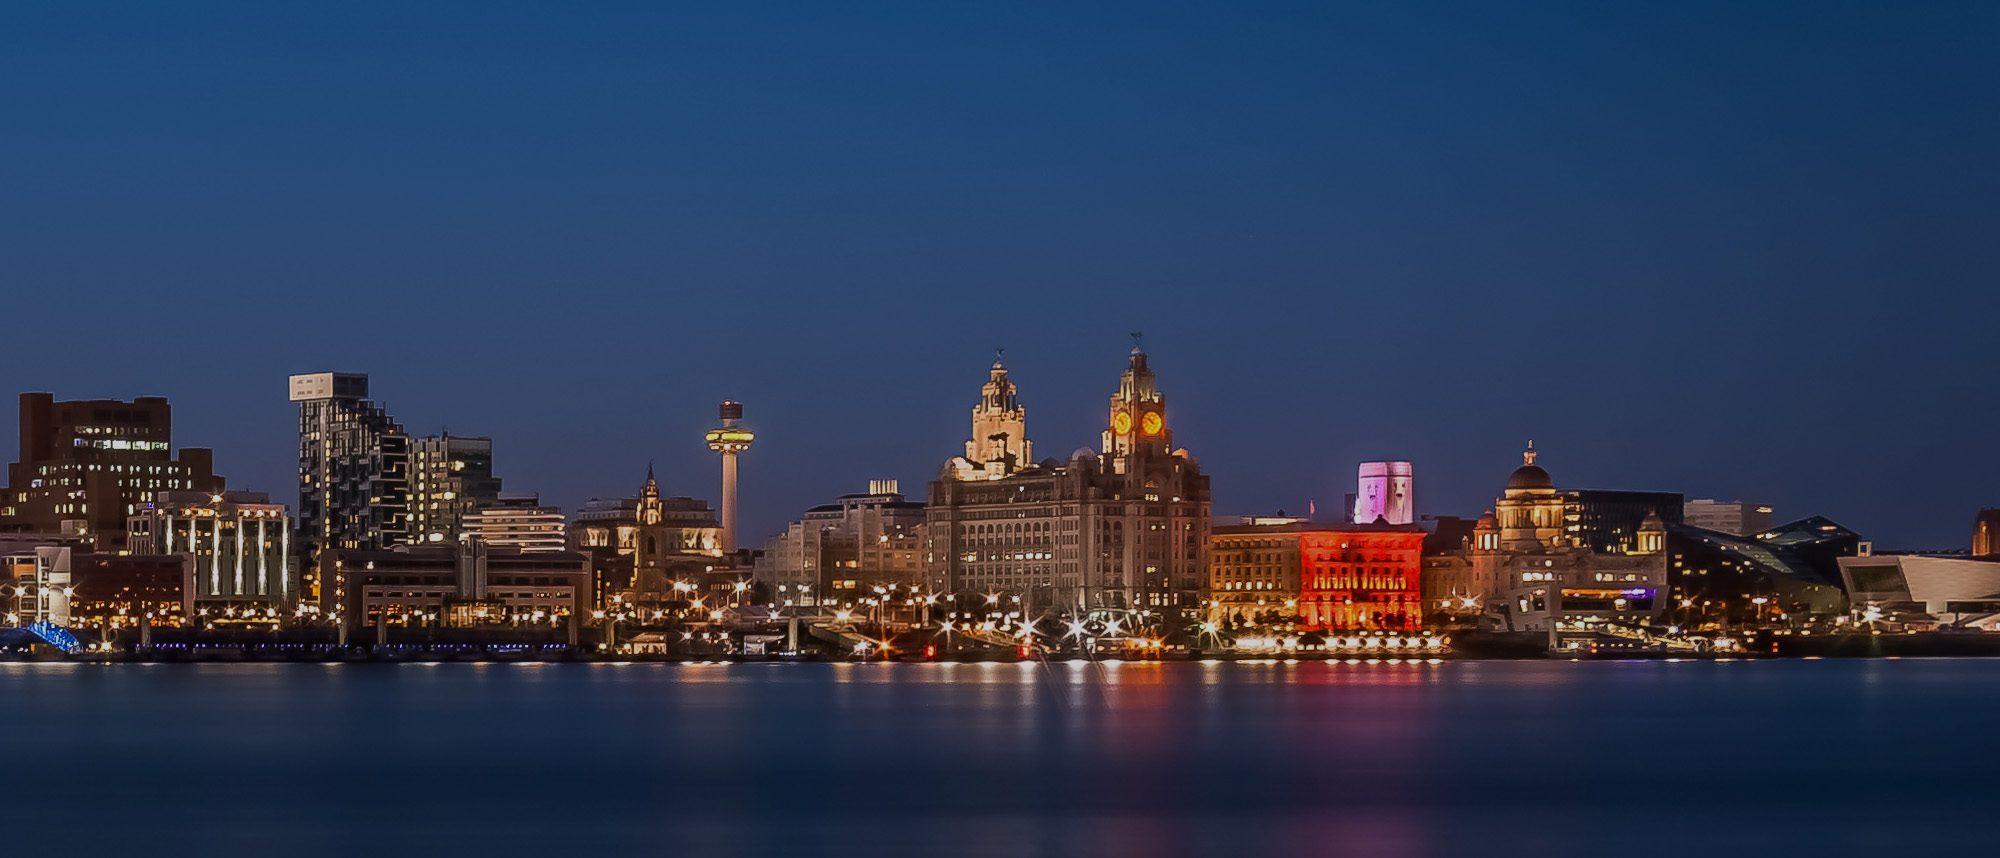 Liverpool European Capital Of Culture 2008